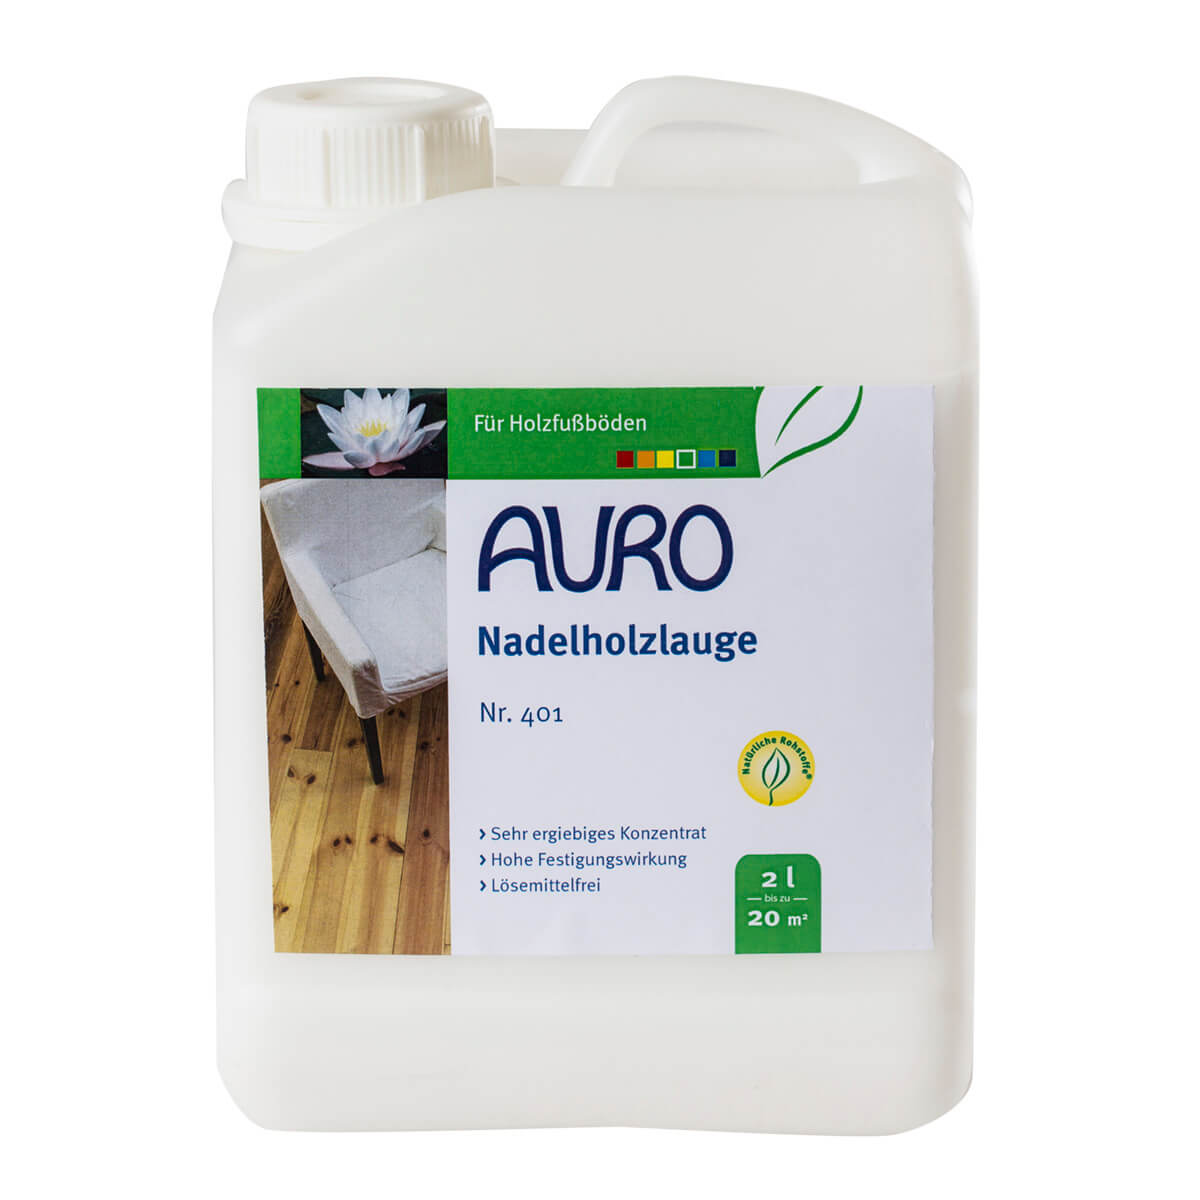 AURO Nadelholzlauge Nr. 401 - 2 L